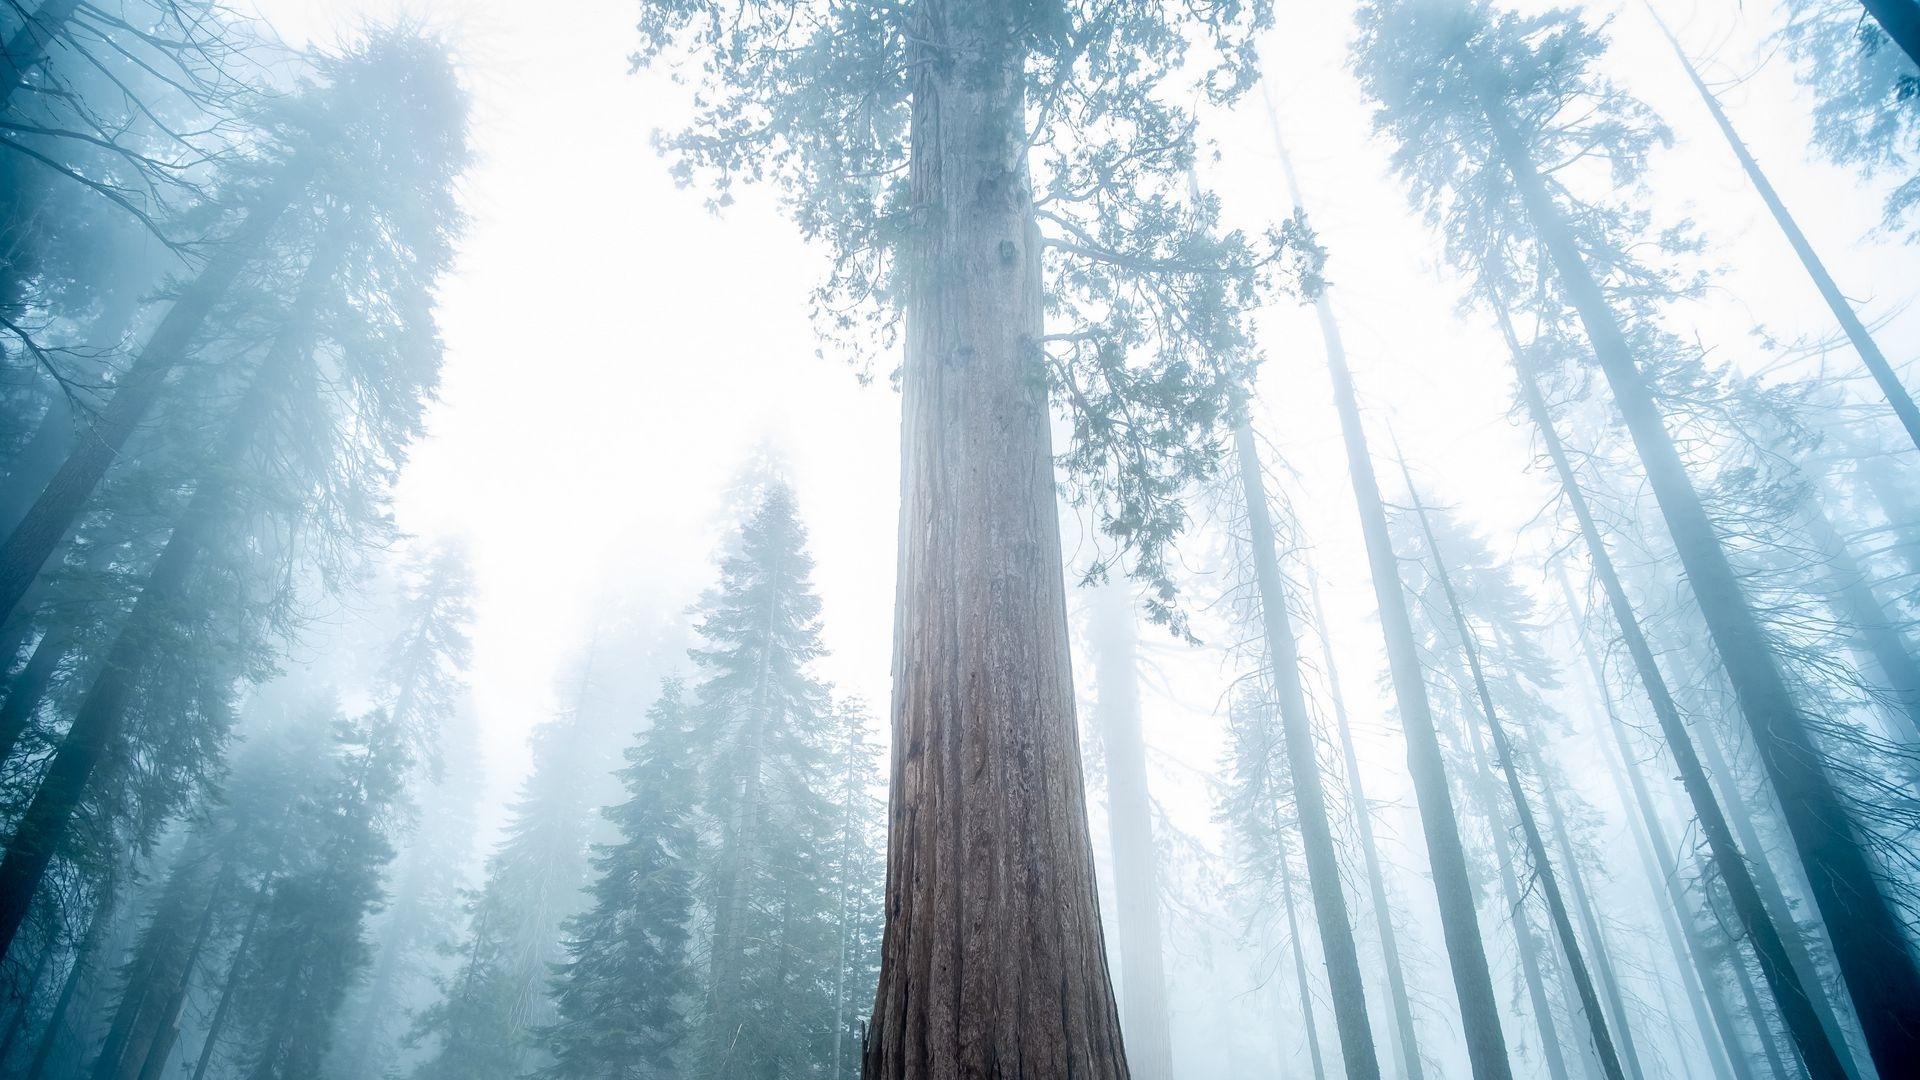 Redwood Trees desktop wallpaper free download